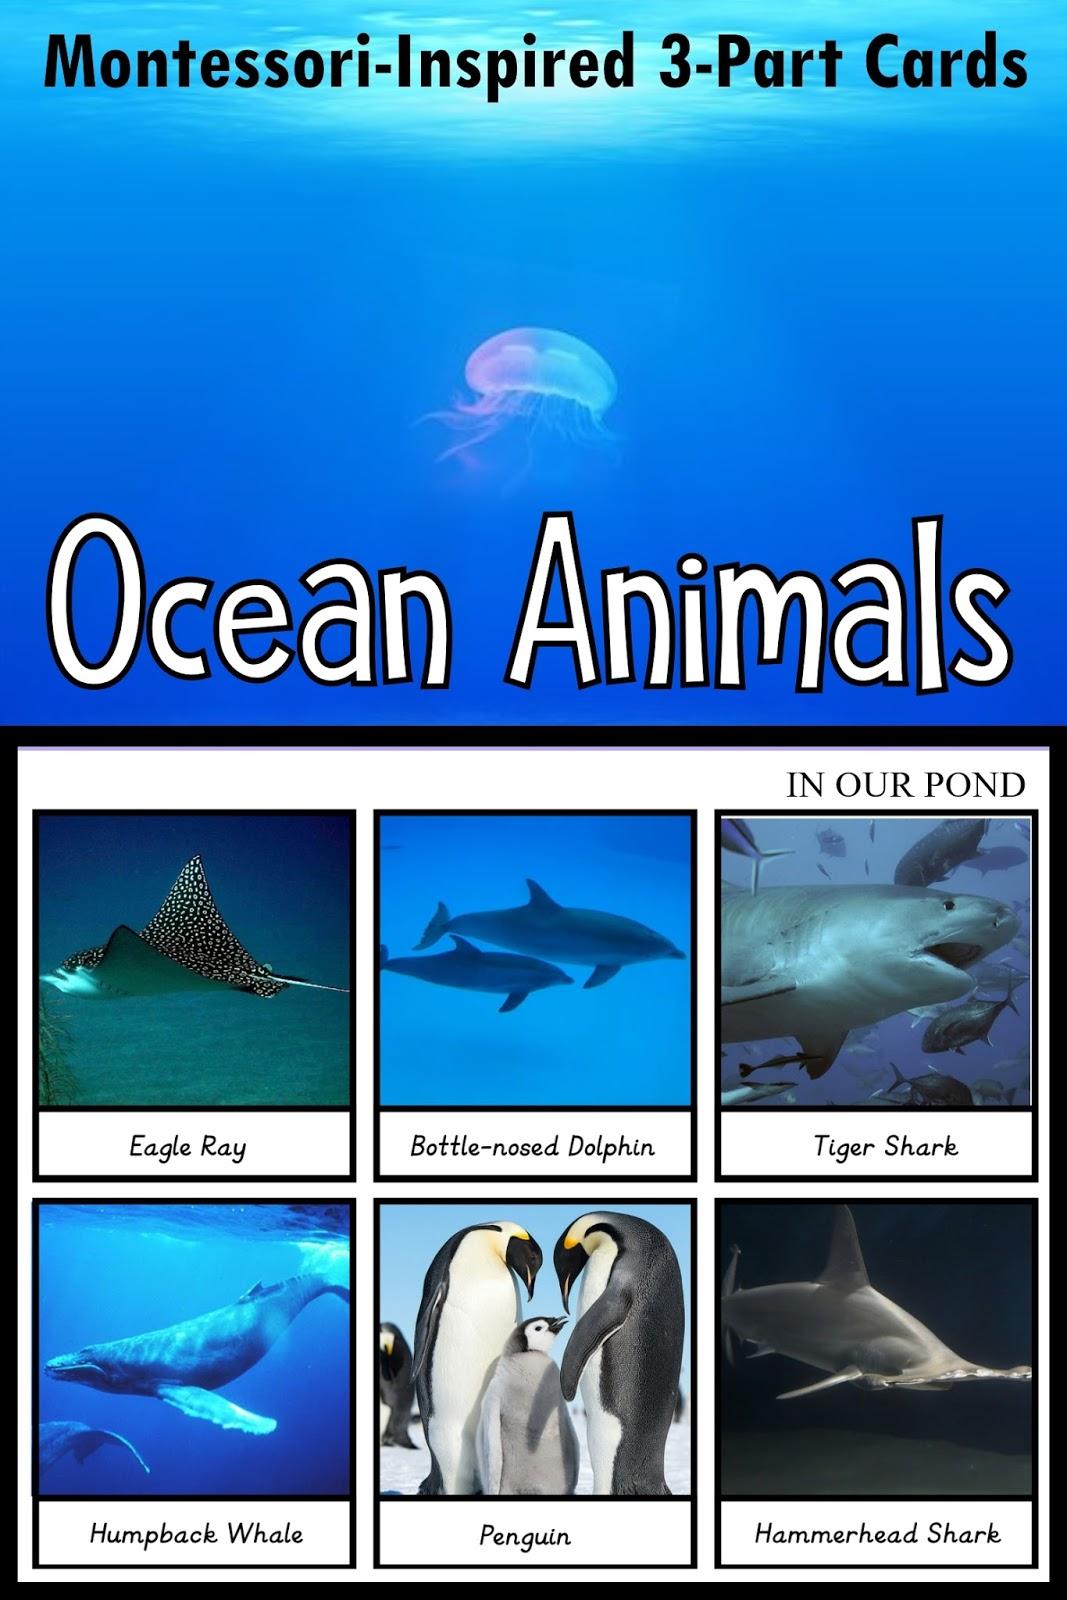 8a2da8487aaed9 Montessori-Inspired 3-Part Matching Card for Safari Ltd Ocean toob    In